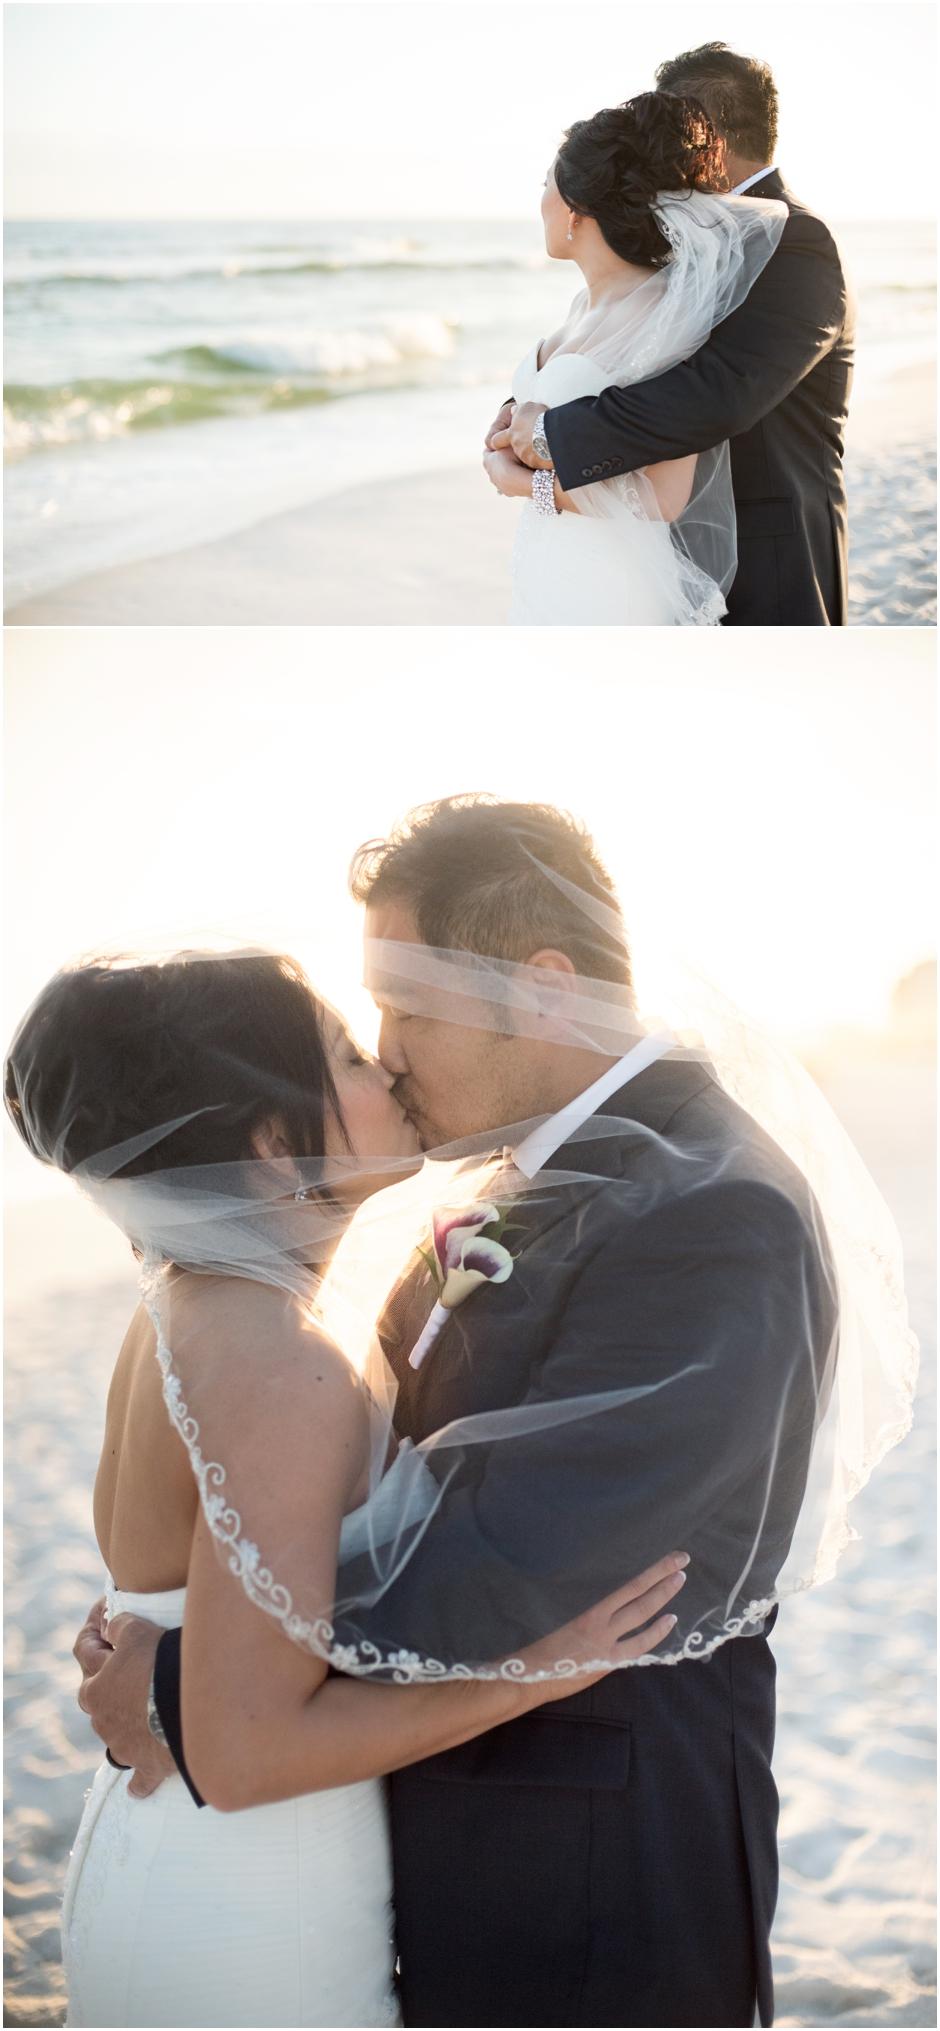 margaritaville beach wedding landshark sunset beach_0042